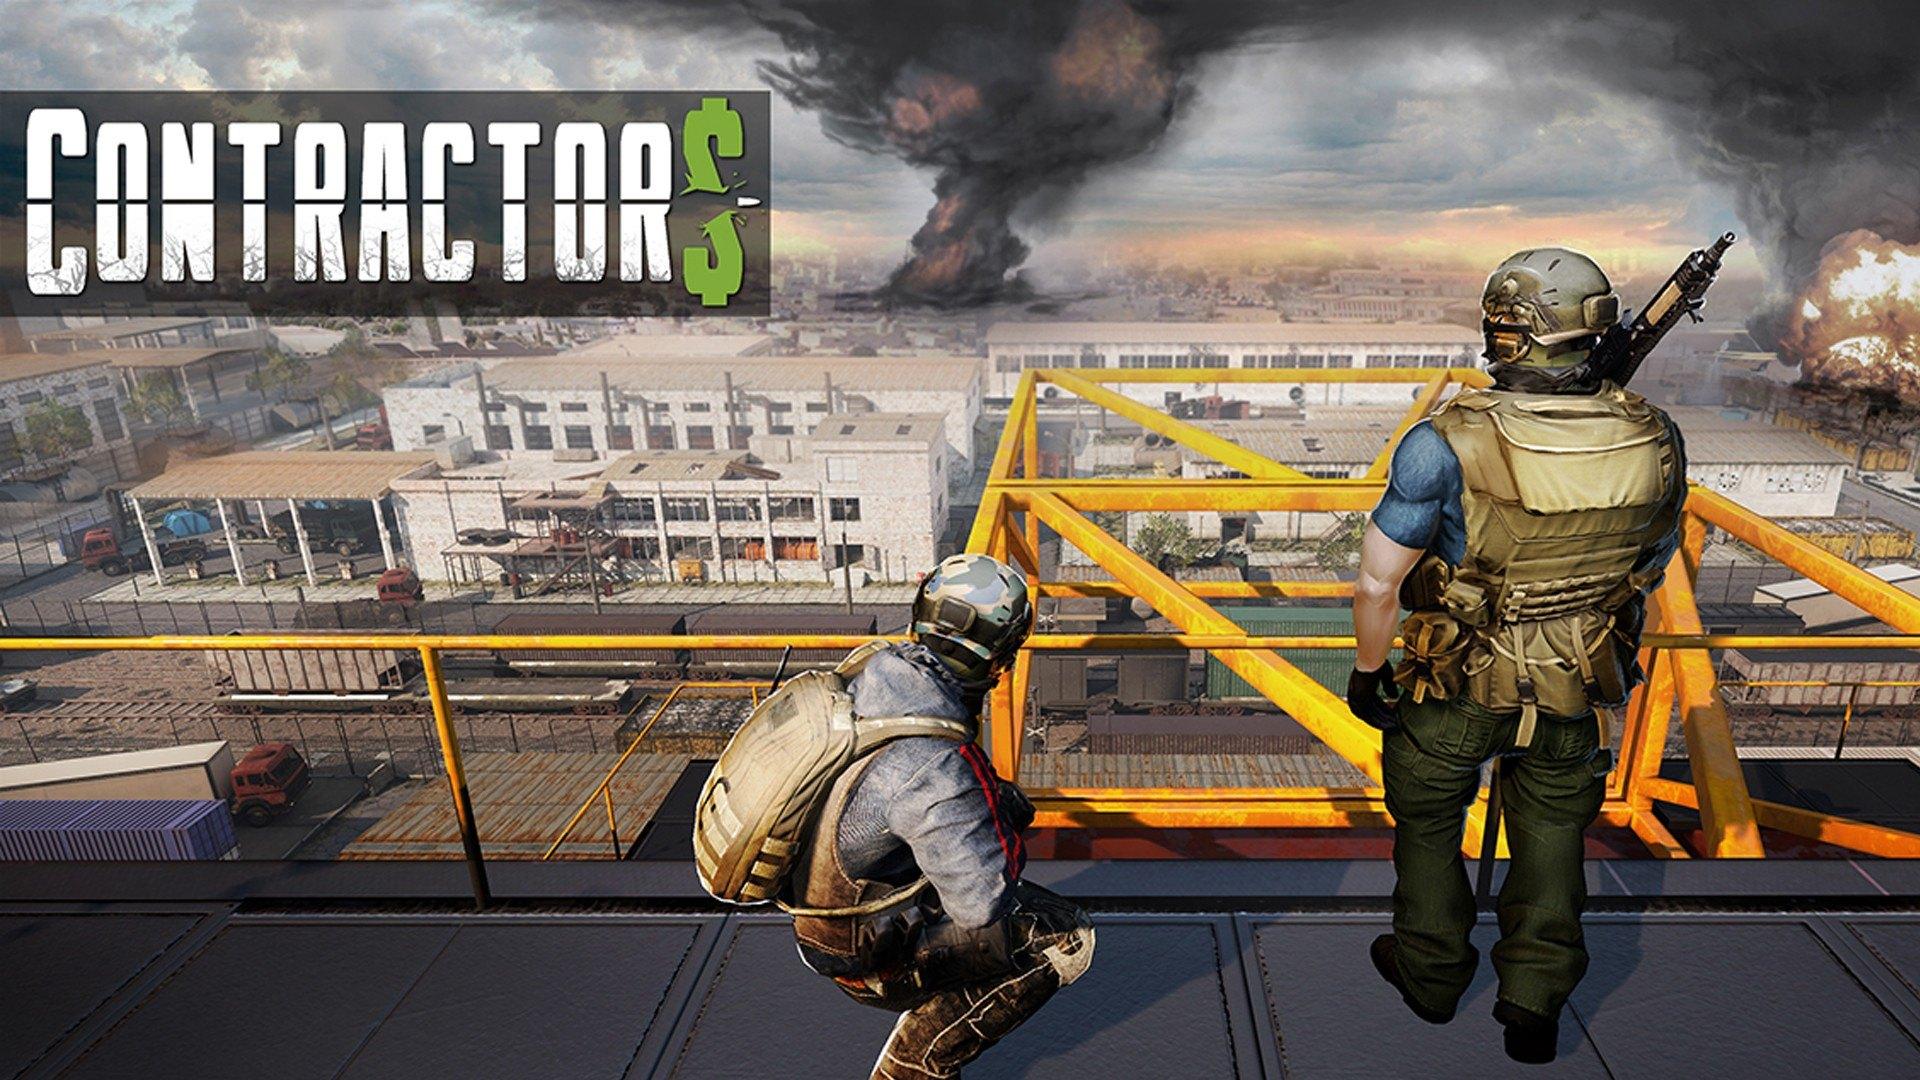 Contractors-Promo_20181016_1920x1080_1